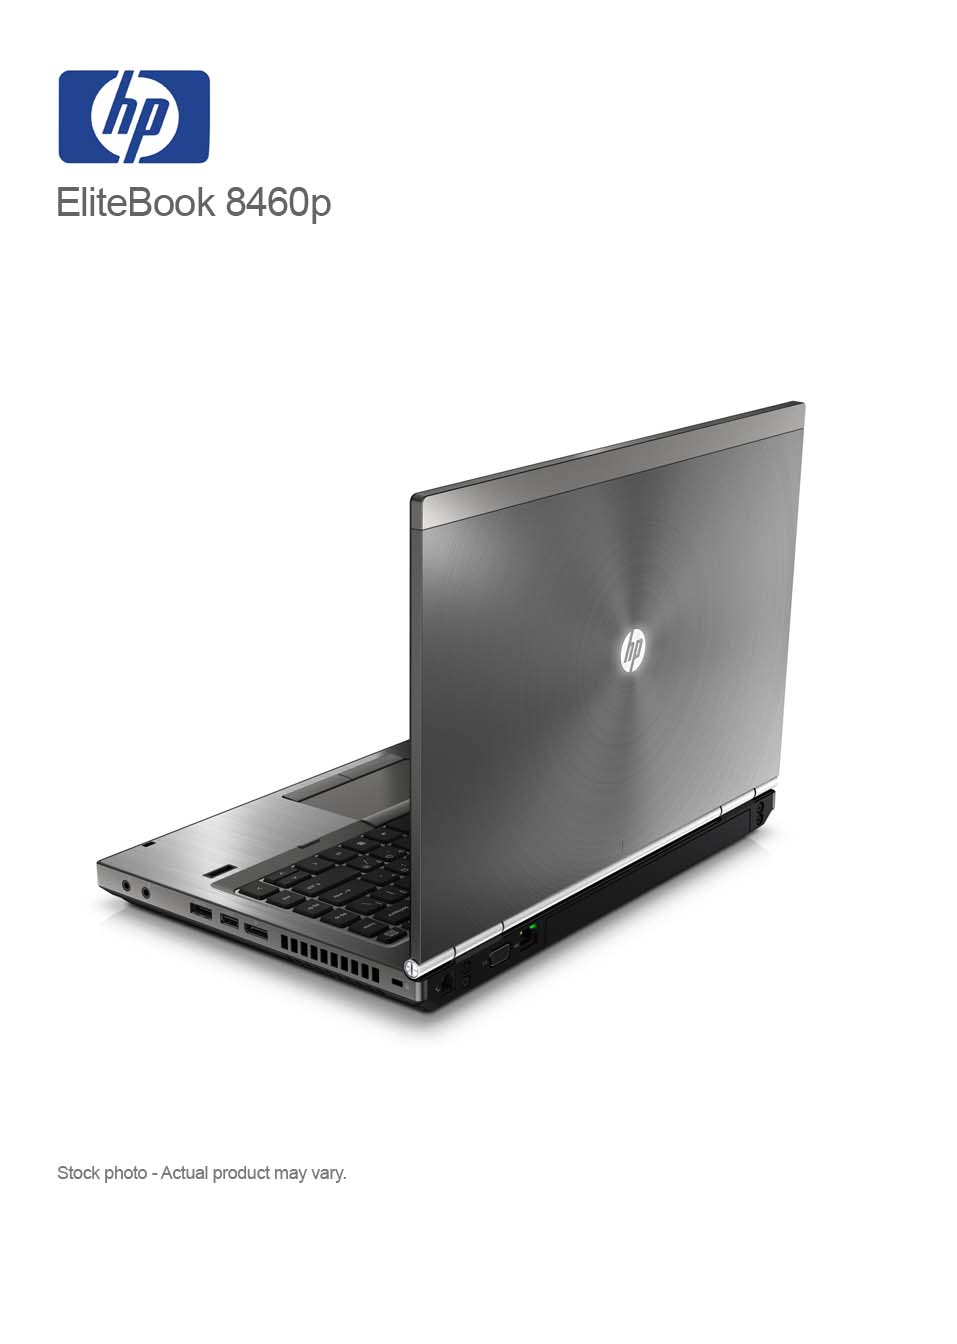 HP EliteBook 8460p Core i5 2520M 4GB 320GB 14